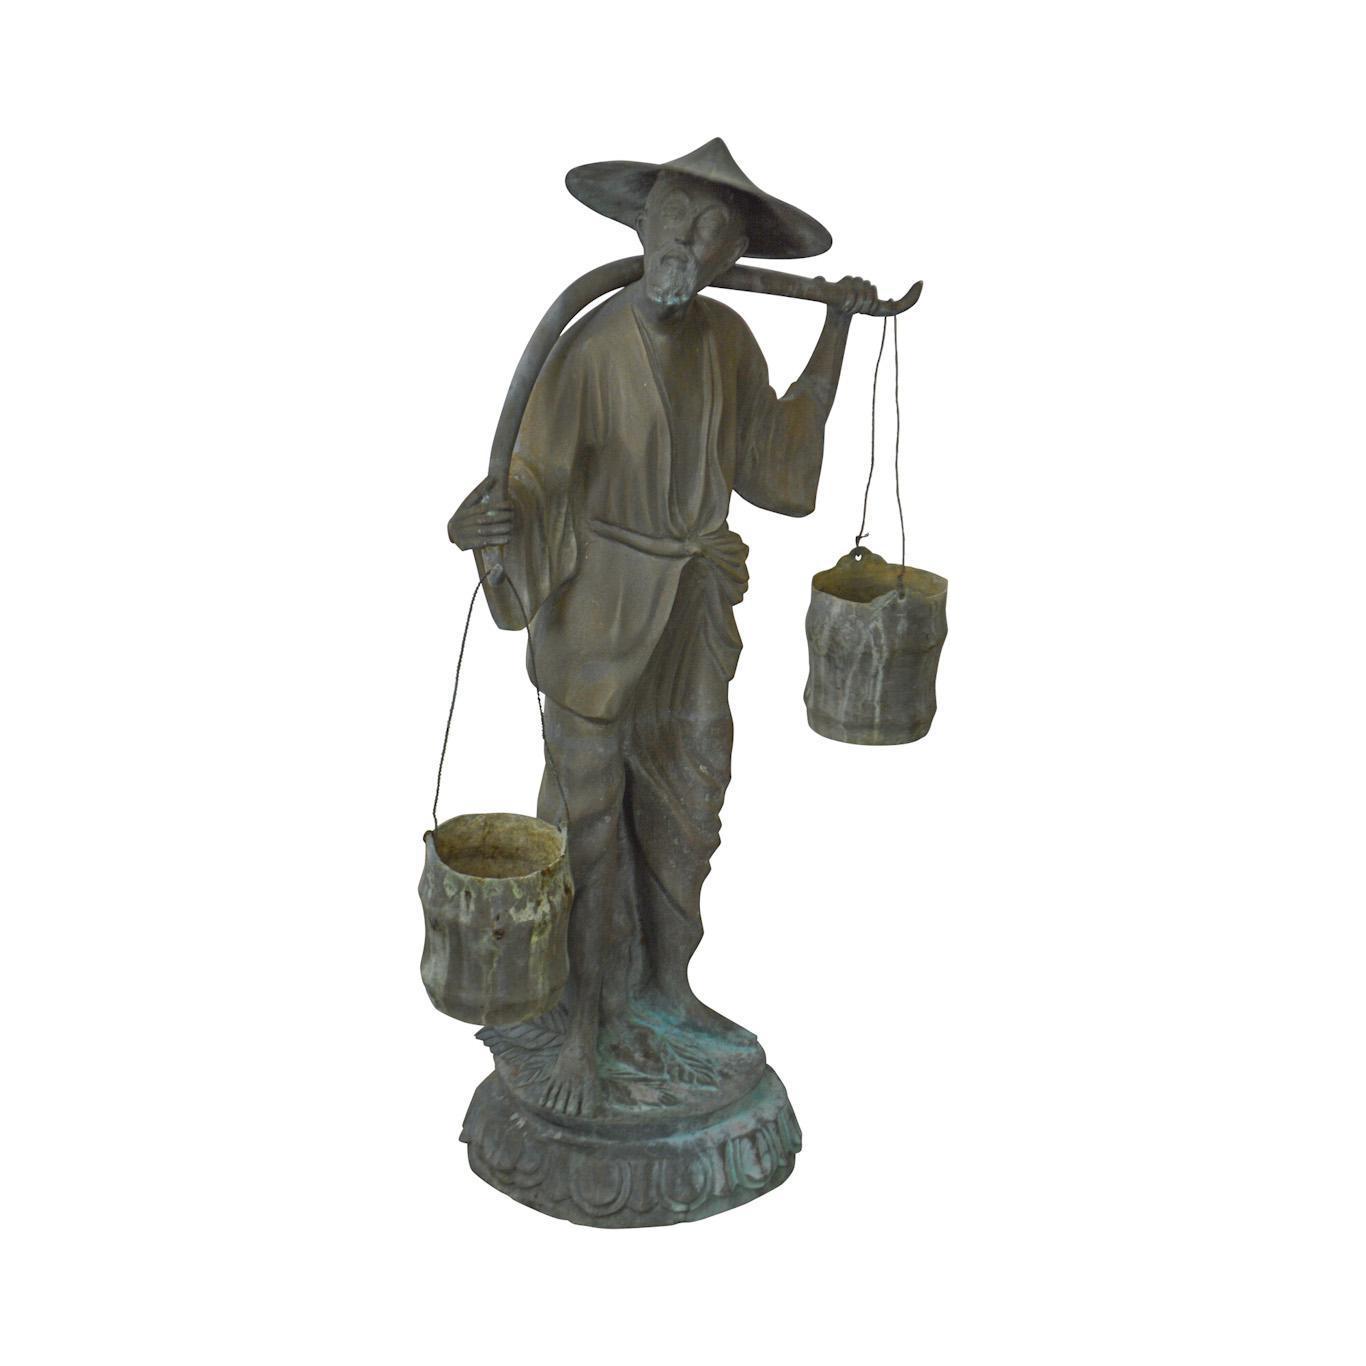 Bronze Weathered Asian Garden Statue Of Man Carrying Water Buckets